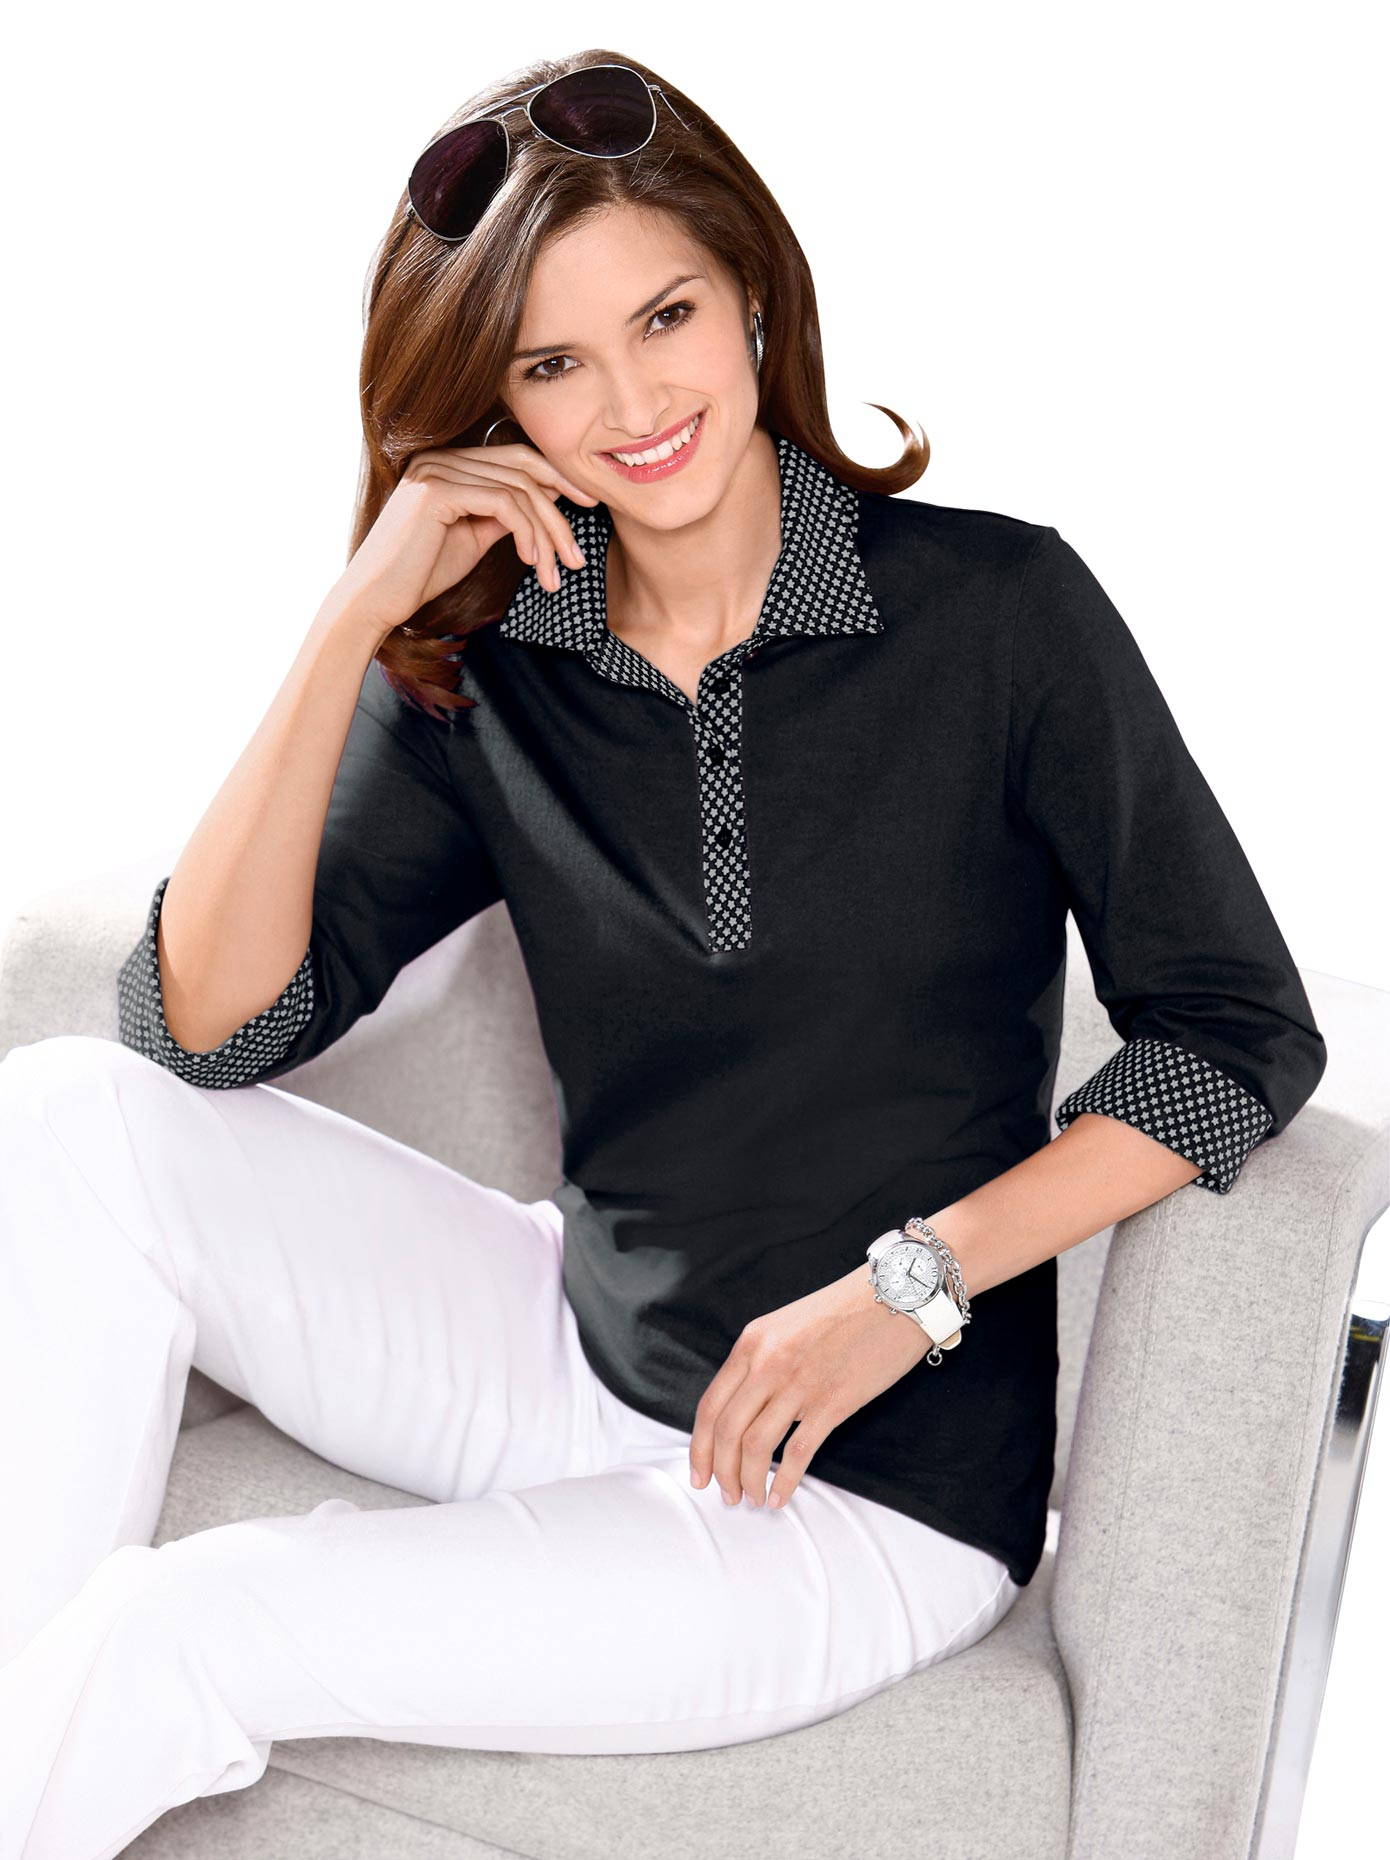 Classic Basics Poloshirt mit Sternchen-Muster bedruckt | Bekleidung > Shirts > Poloshirts | Classic Basics